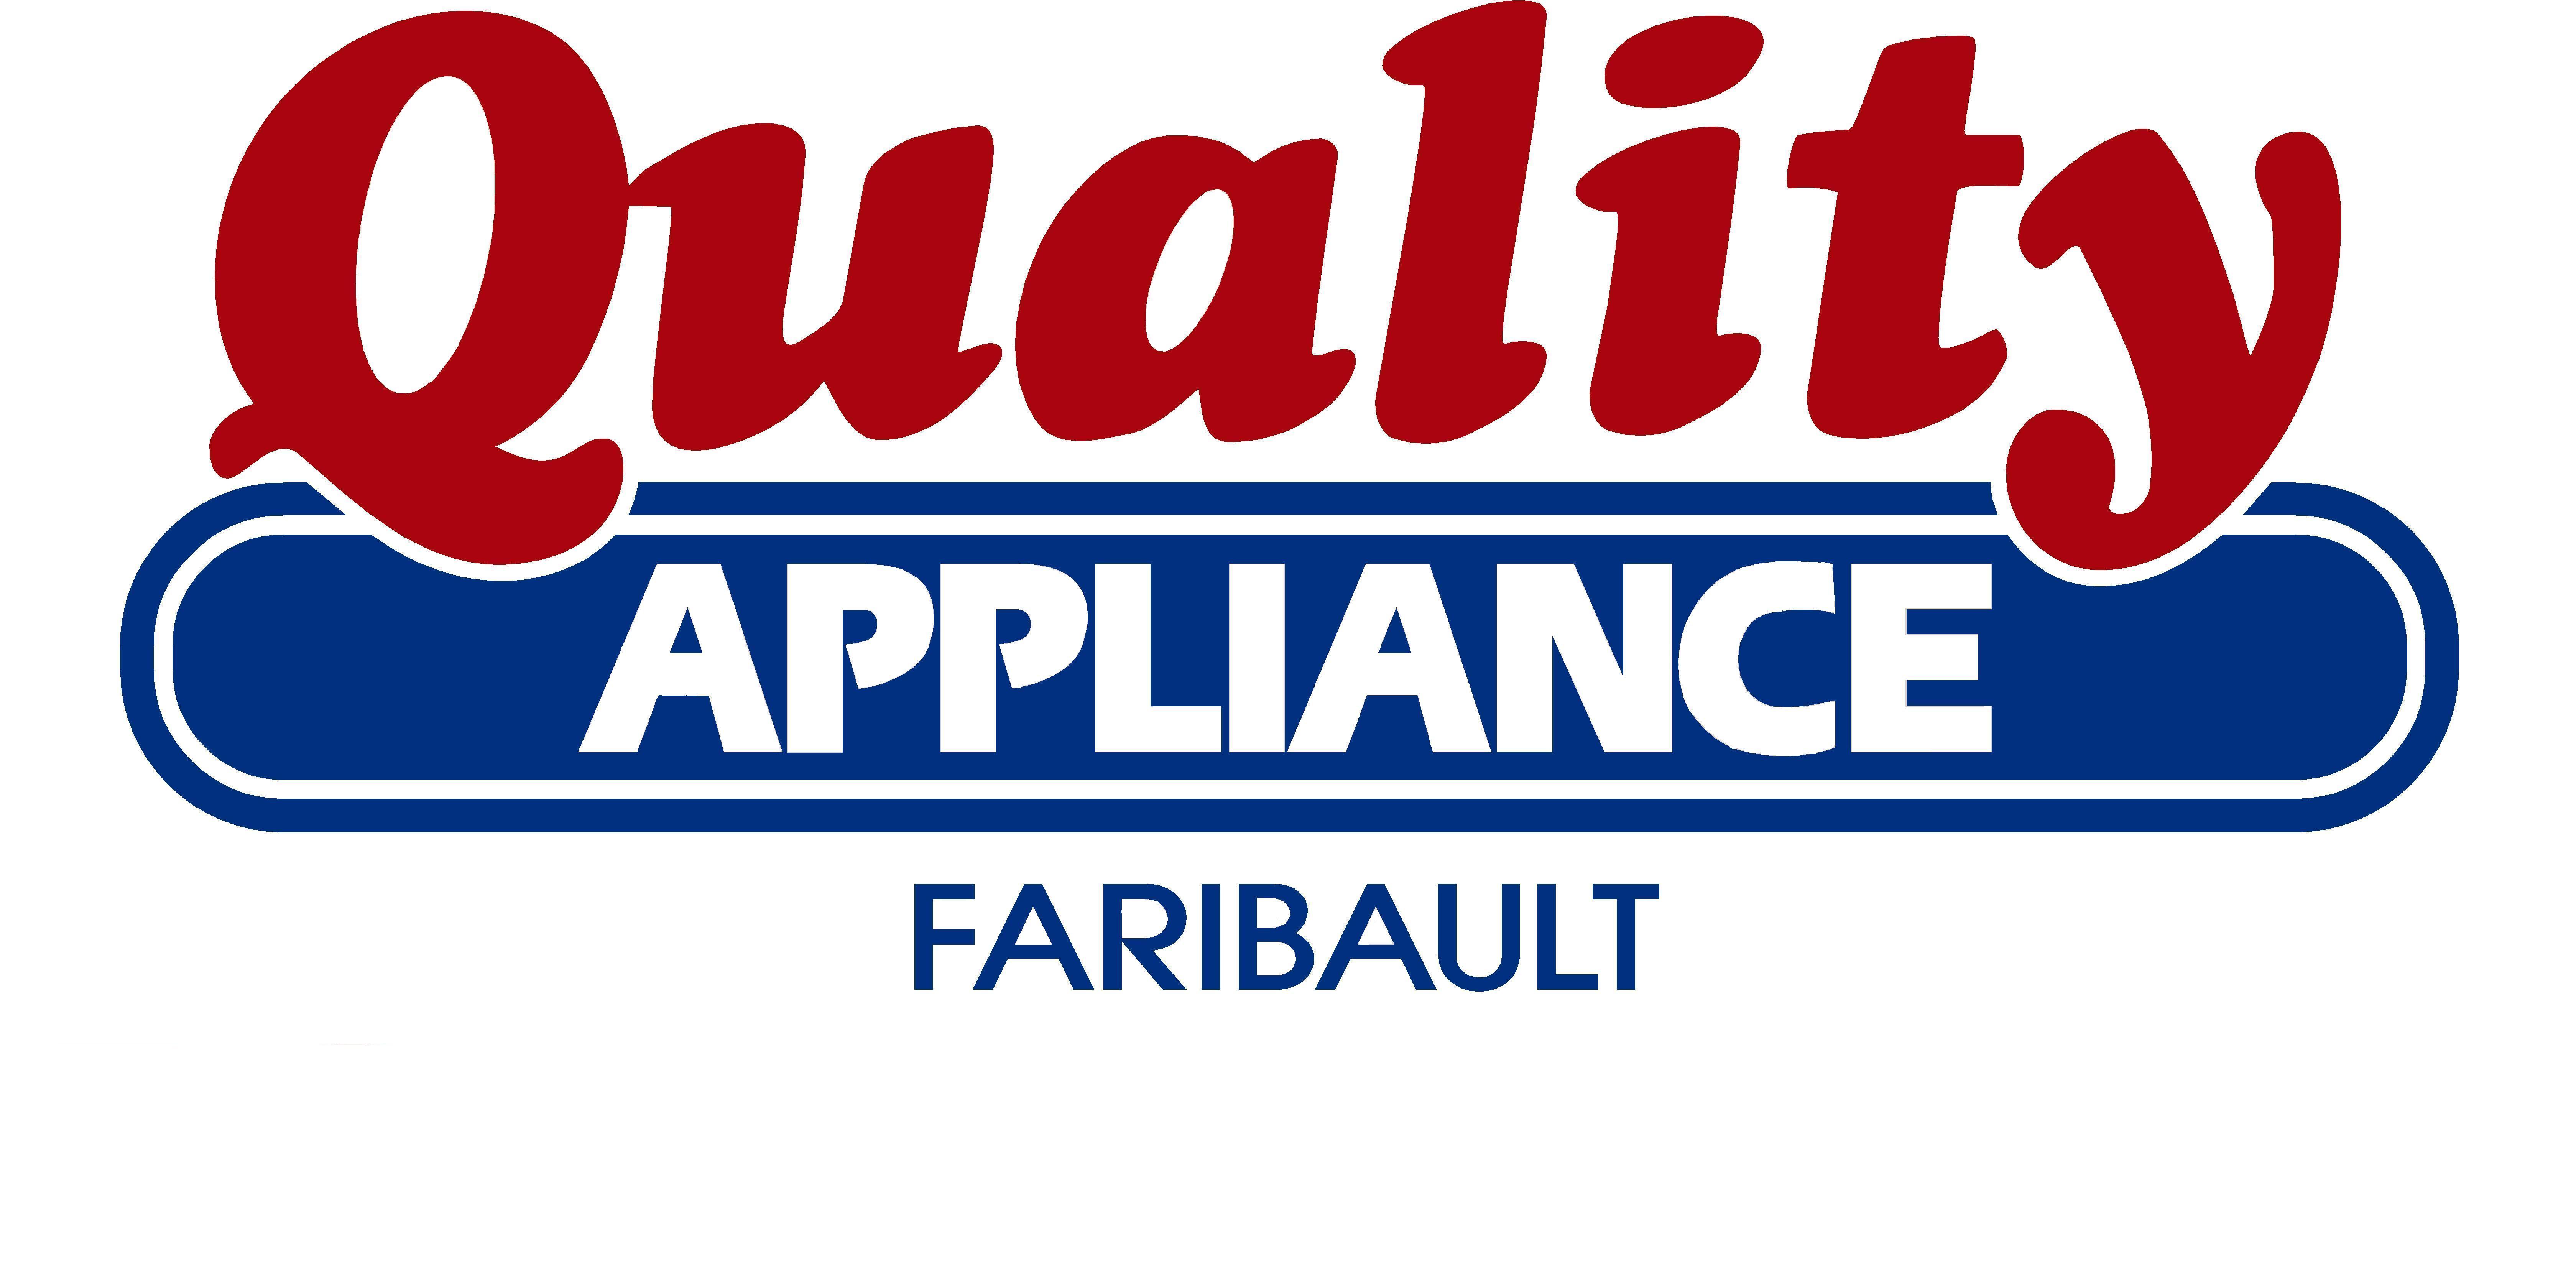 Silver - Quality Appliance - Logo